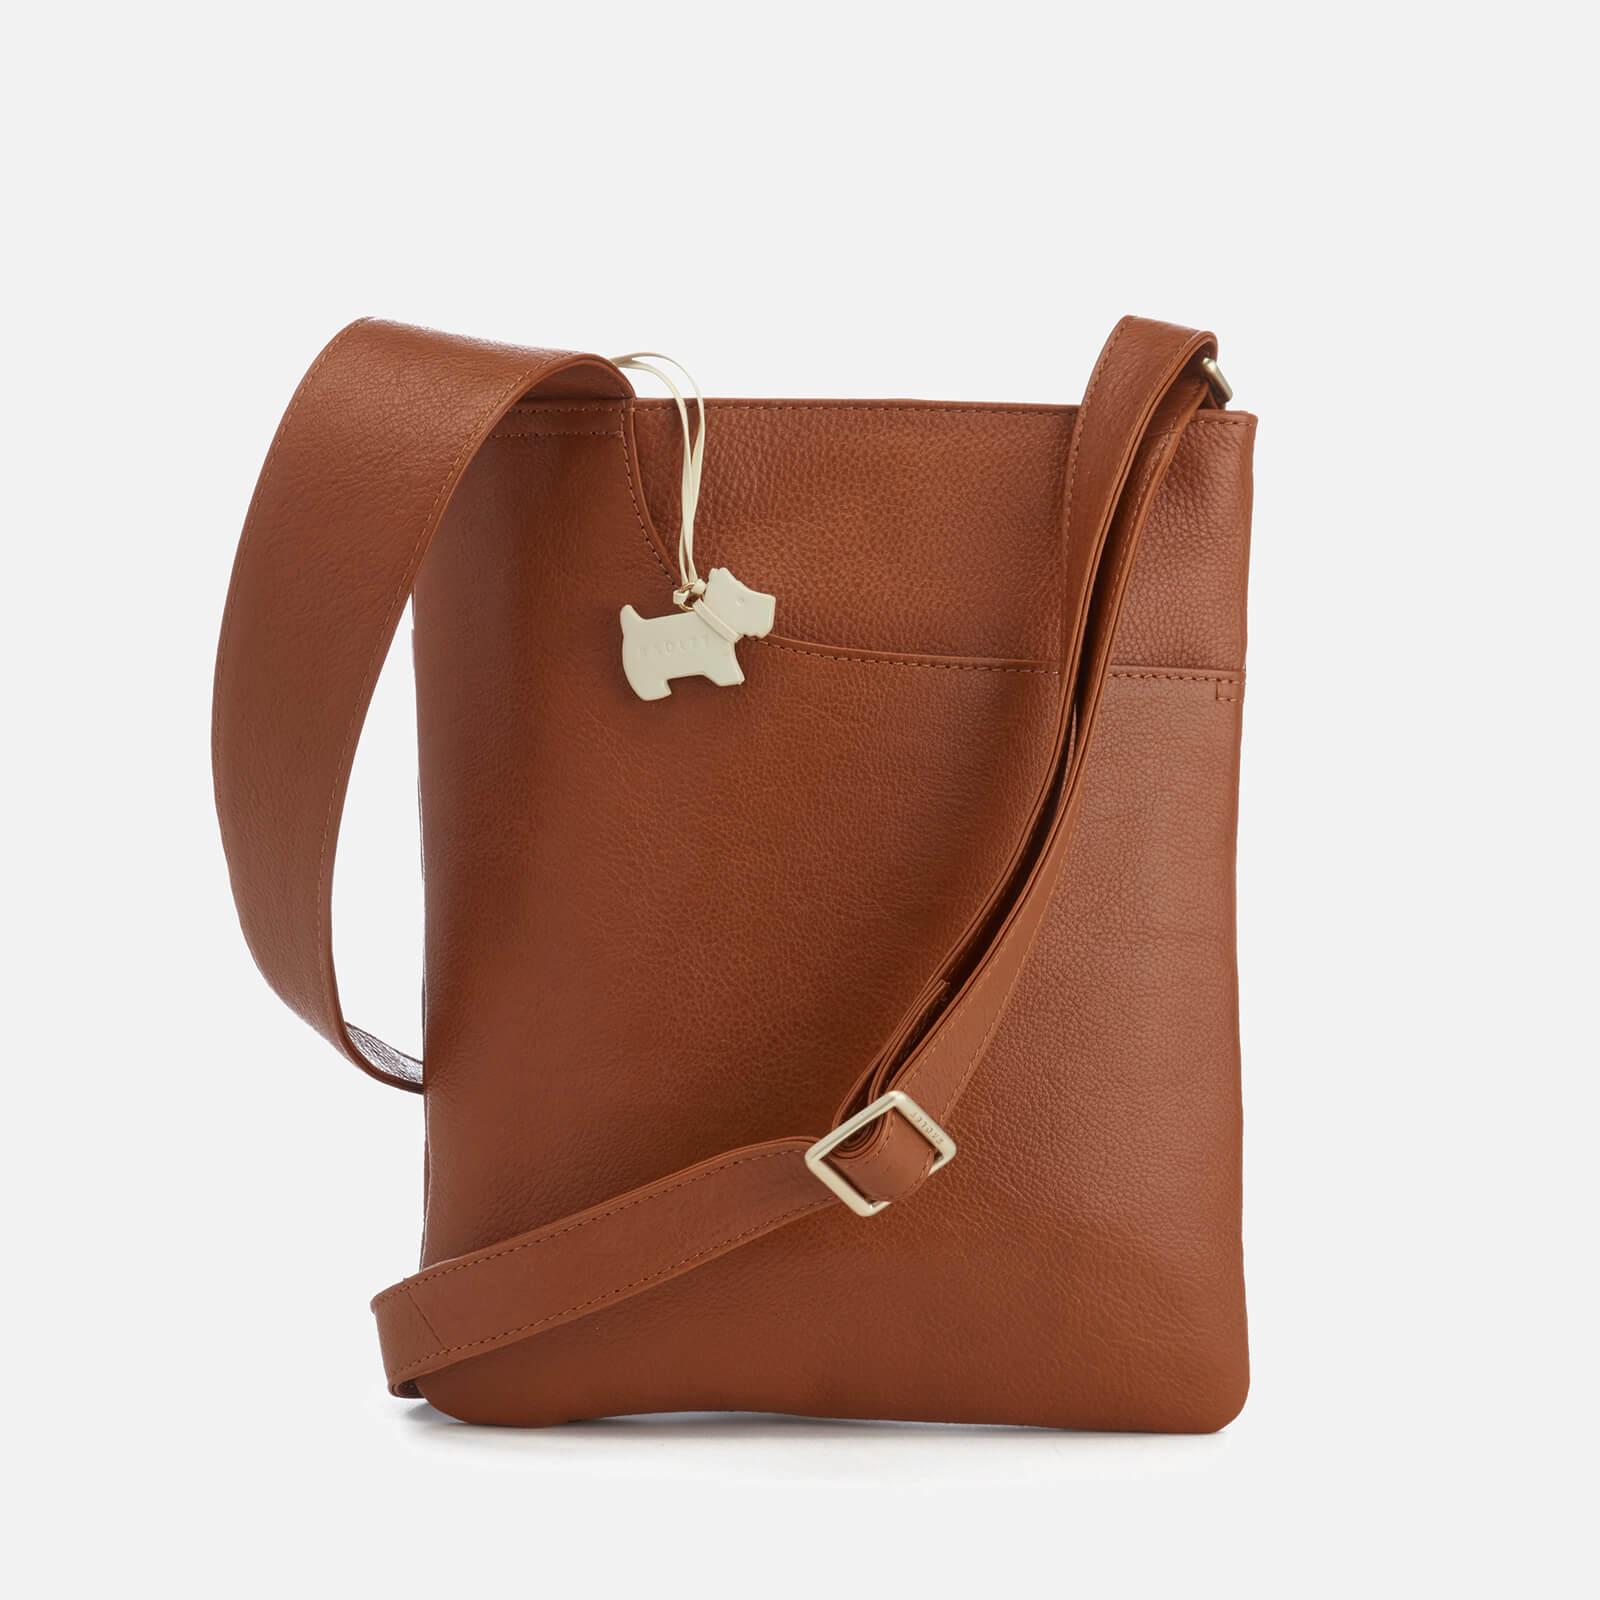 53f6d6c0fb38 Radley Women's Pocket Bag Medium Zip Top Cross Body Bag - Tan - Free UK  Delivery over £50